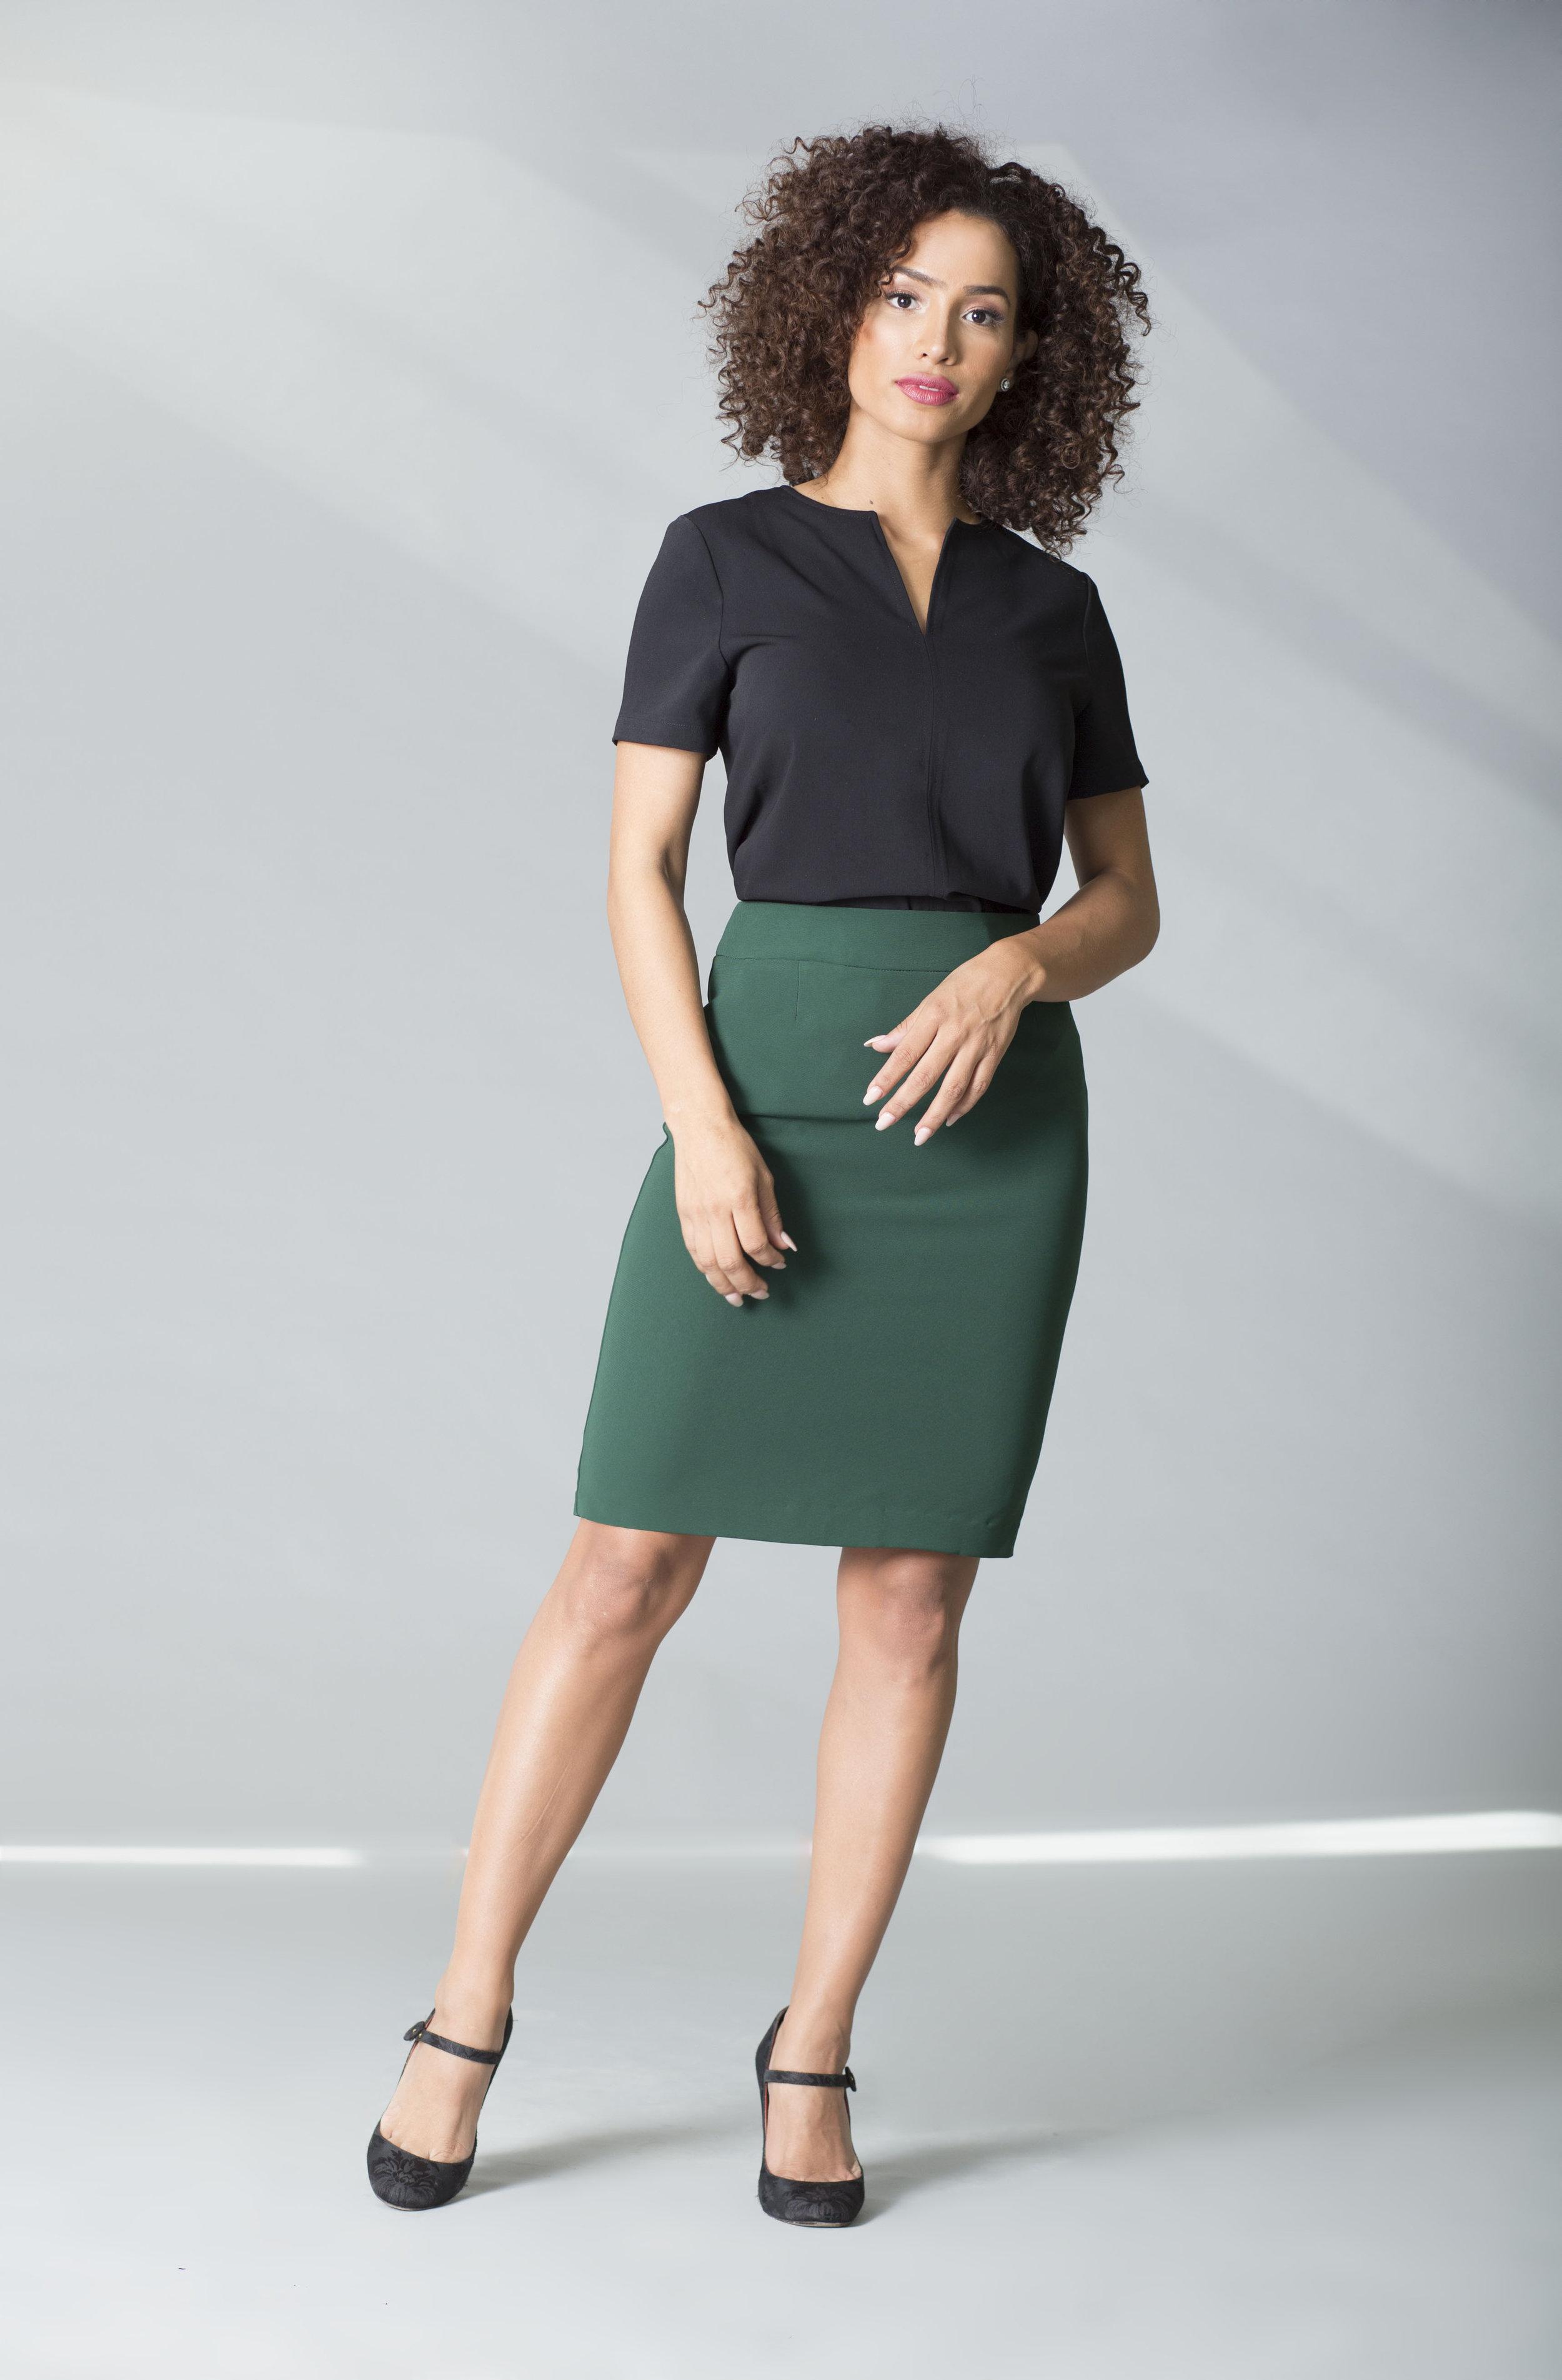 MRC mili negra falda verde copy.jpg